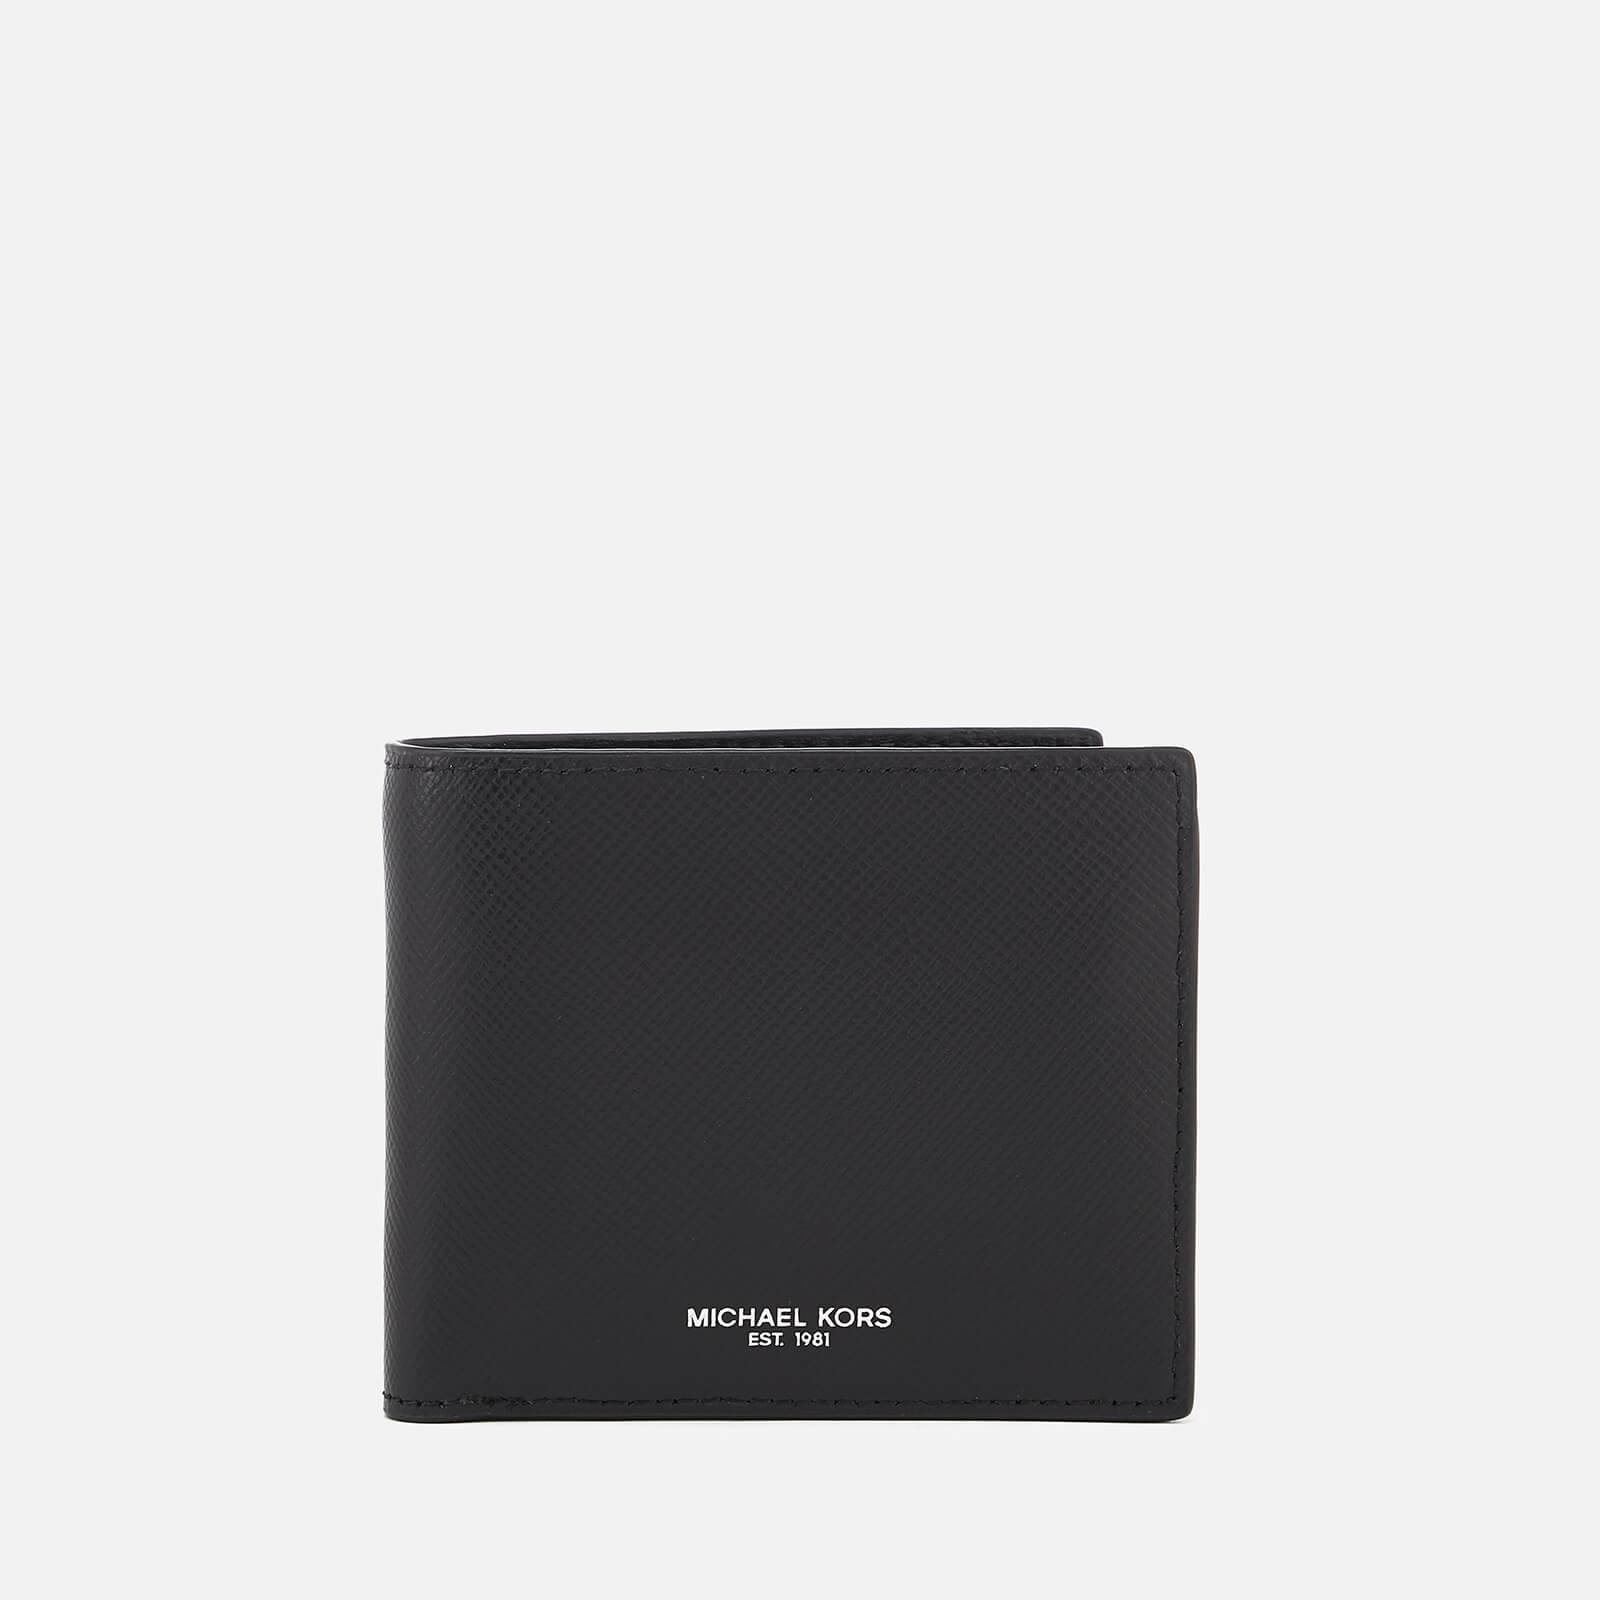 Michael Kors Men's Harrison Billfold Wallet With Coin Pocket - Black